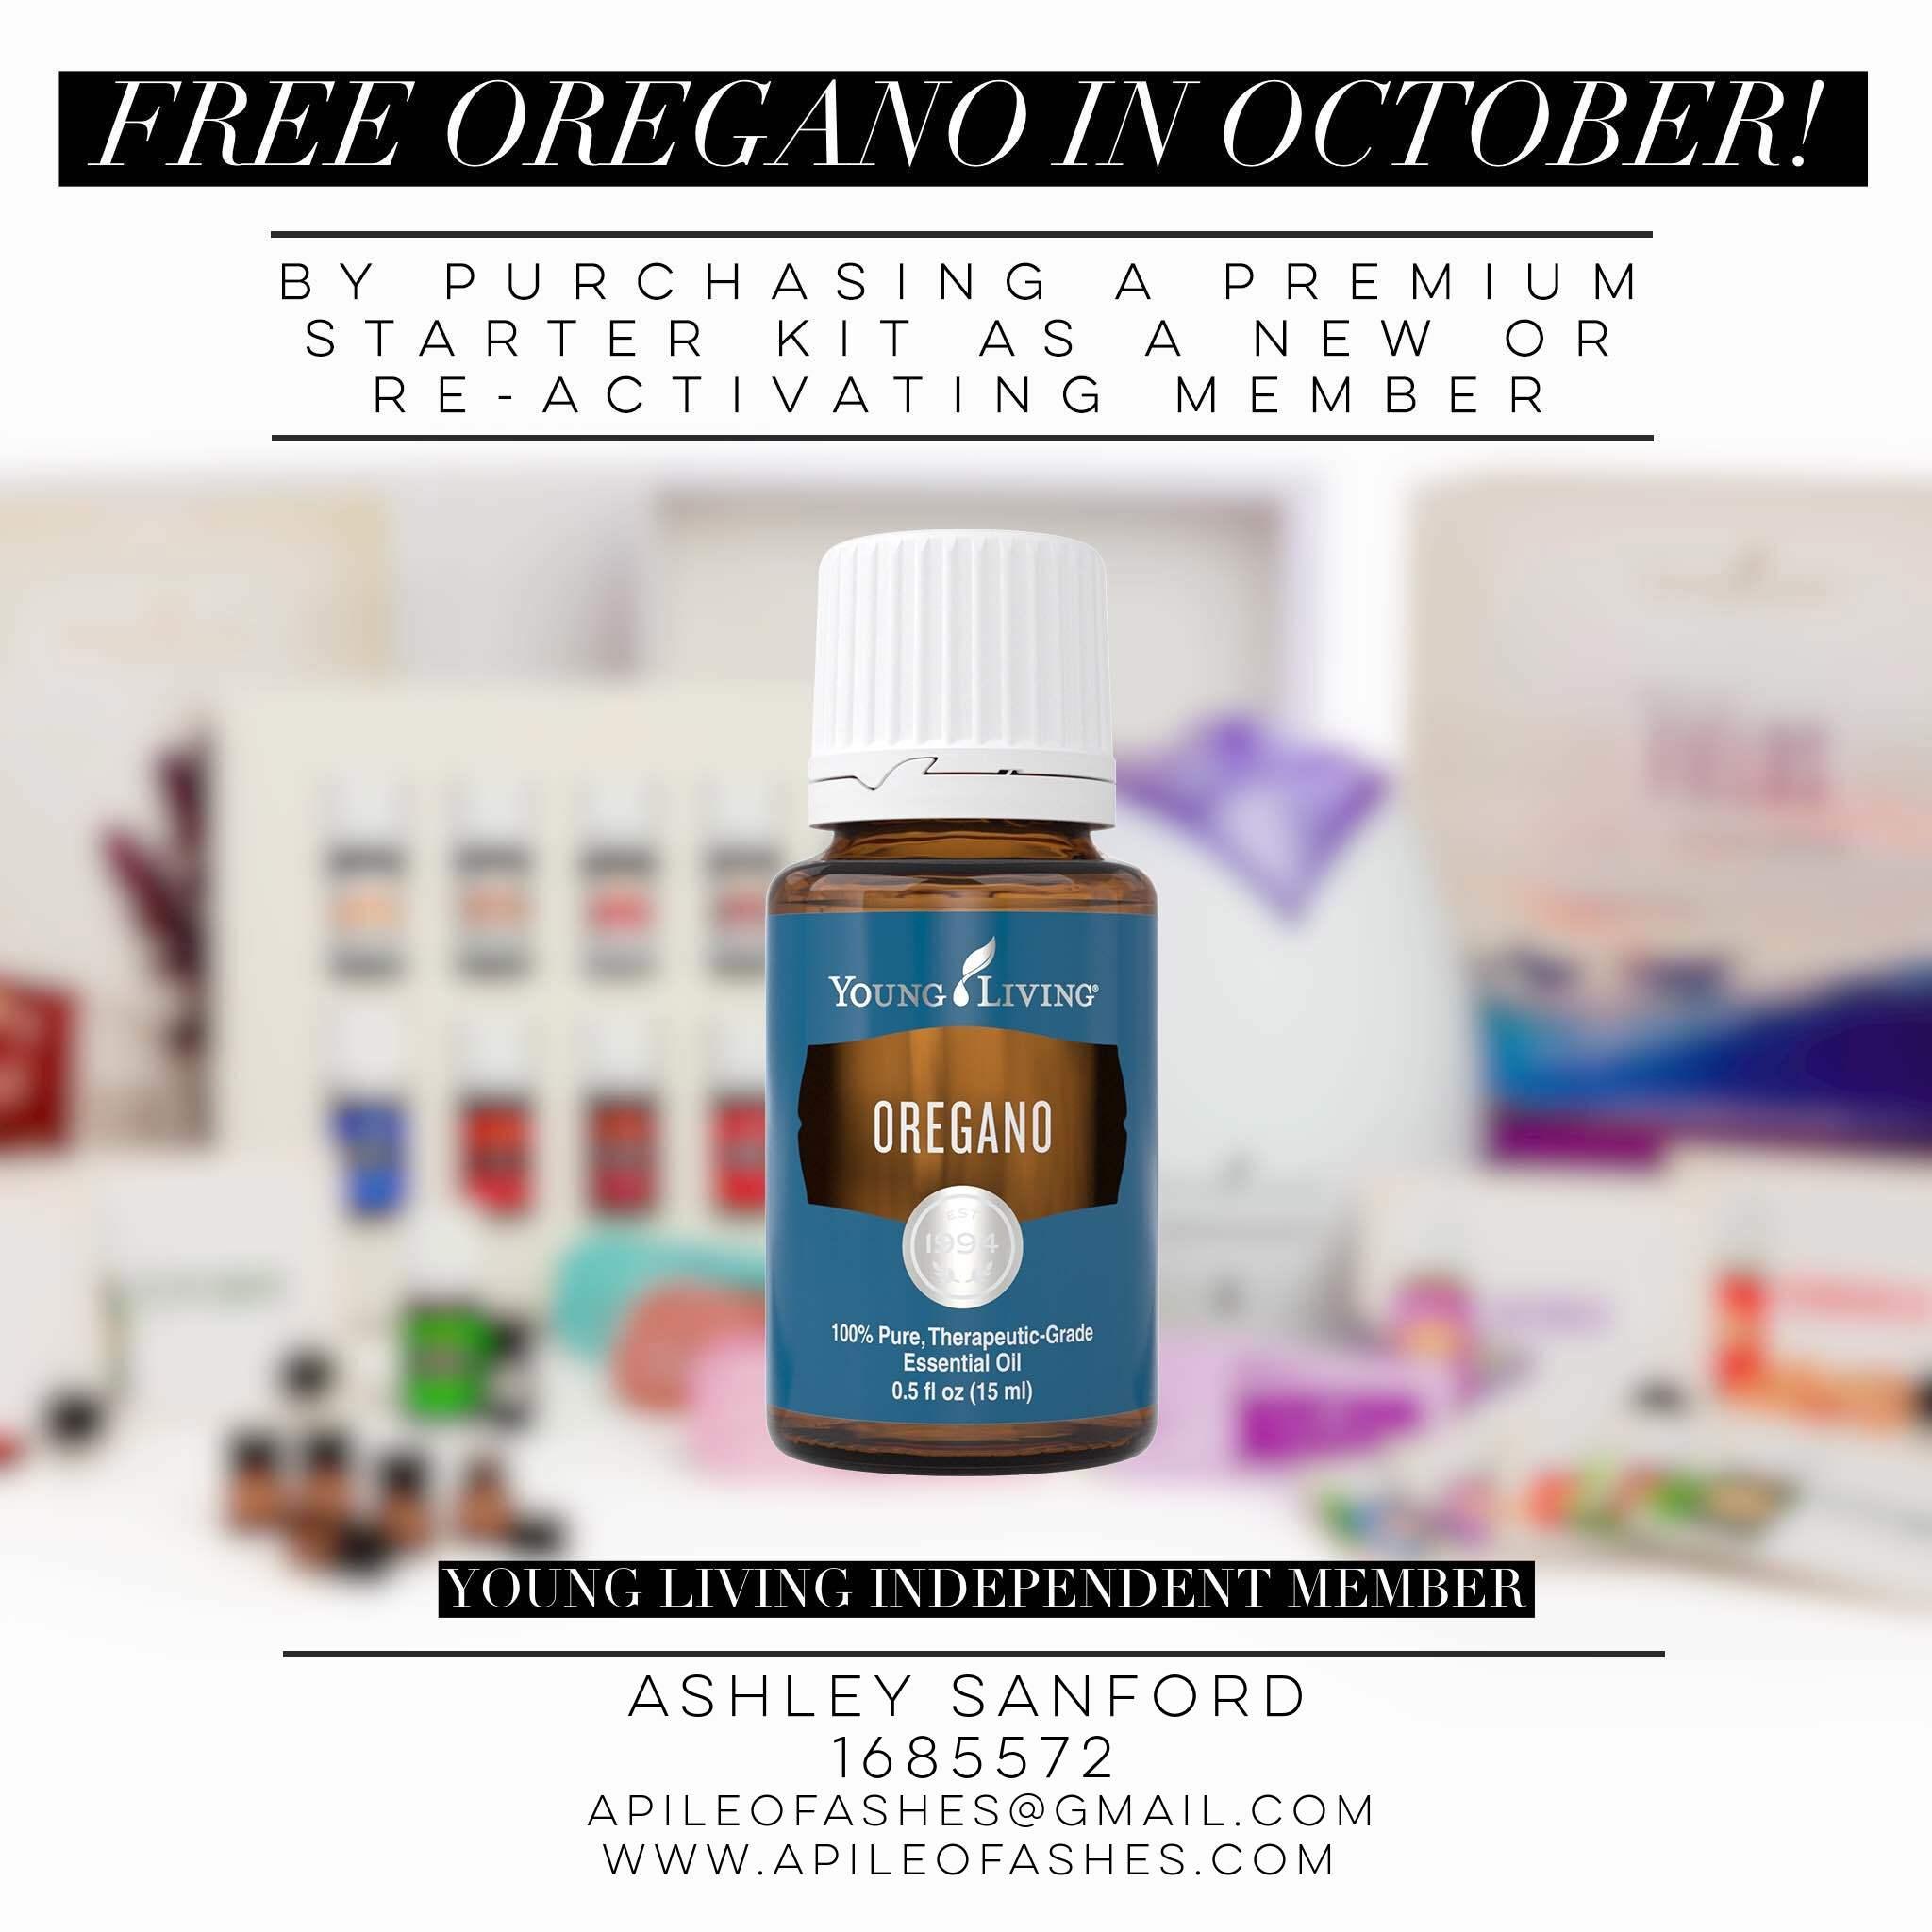 free-oregano-october